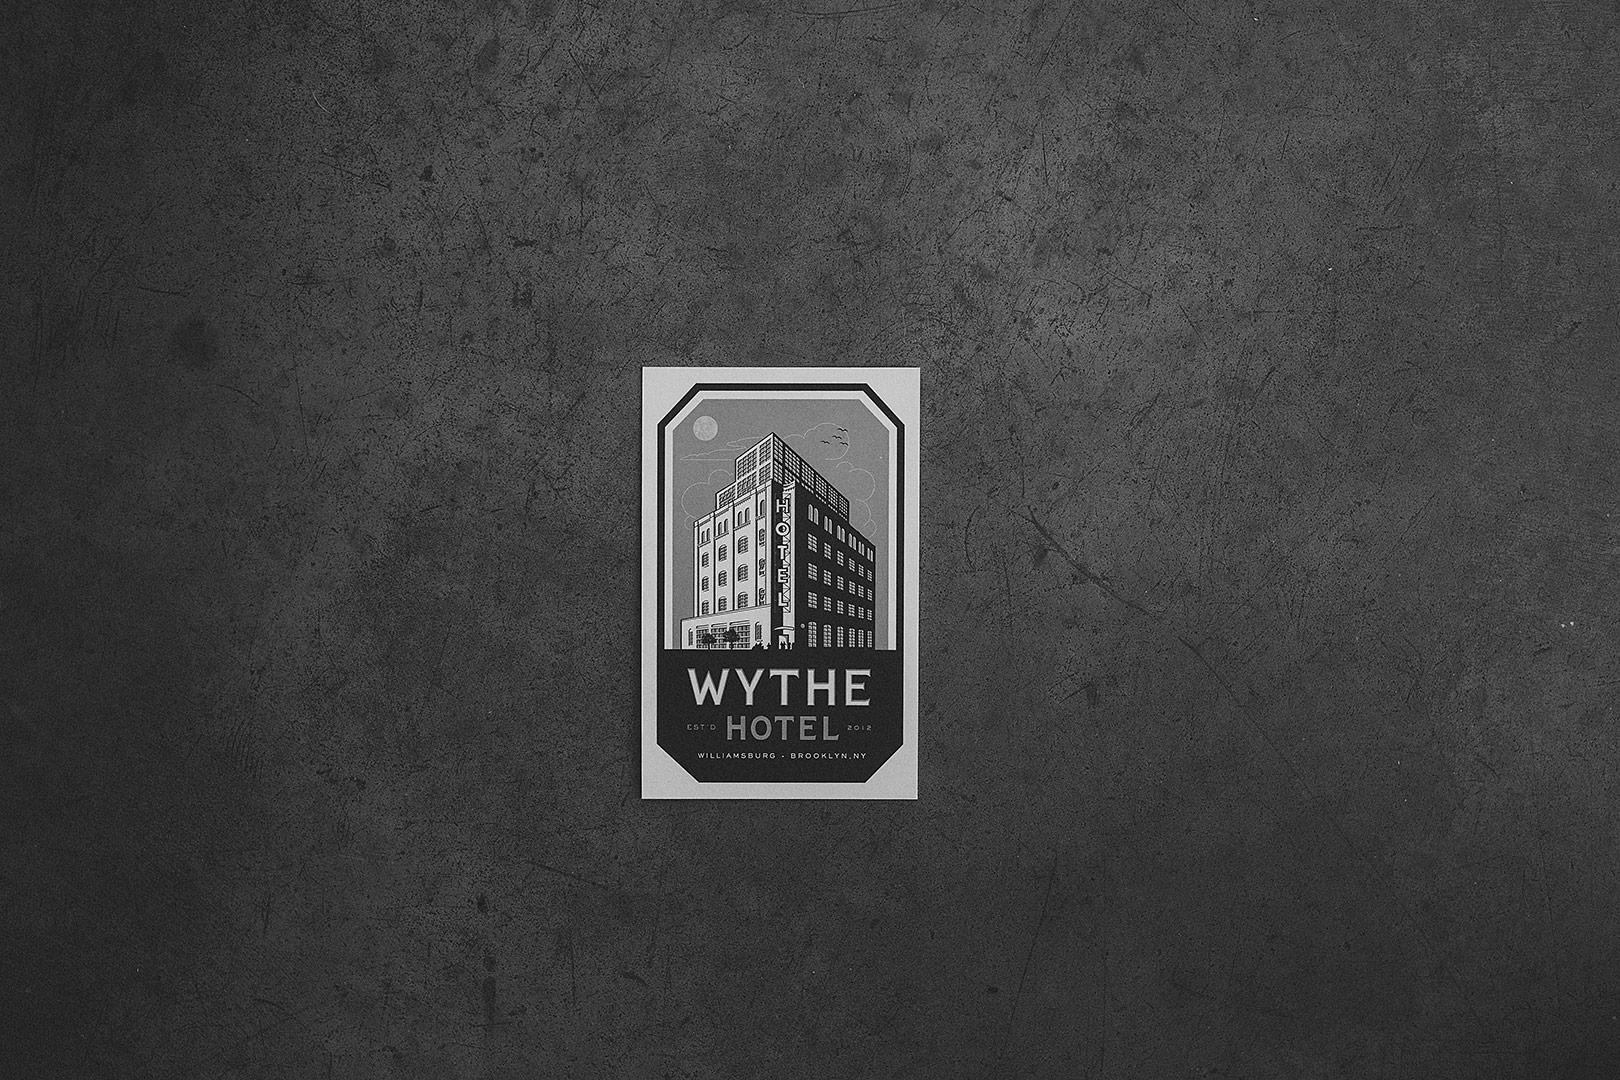 wythe-hotel